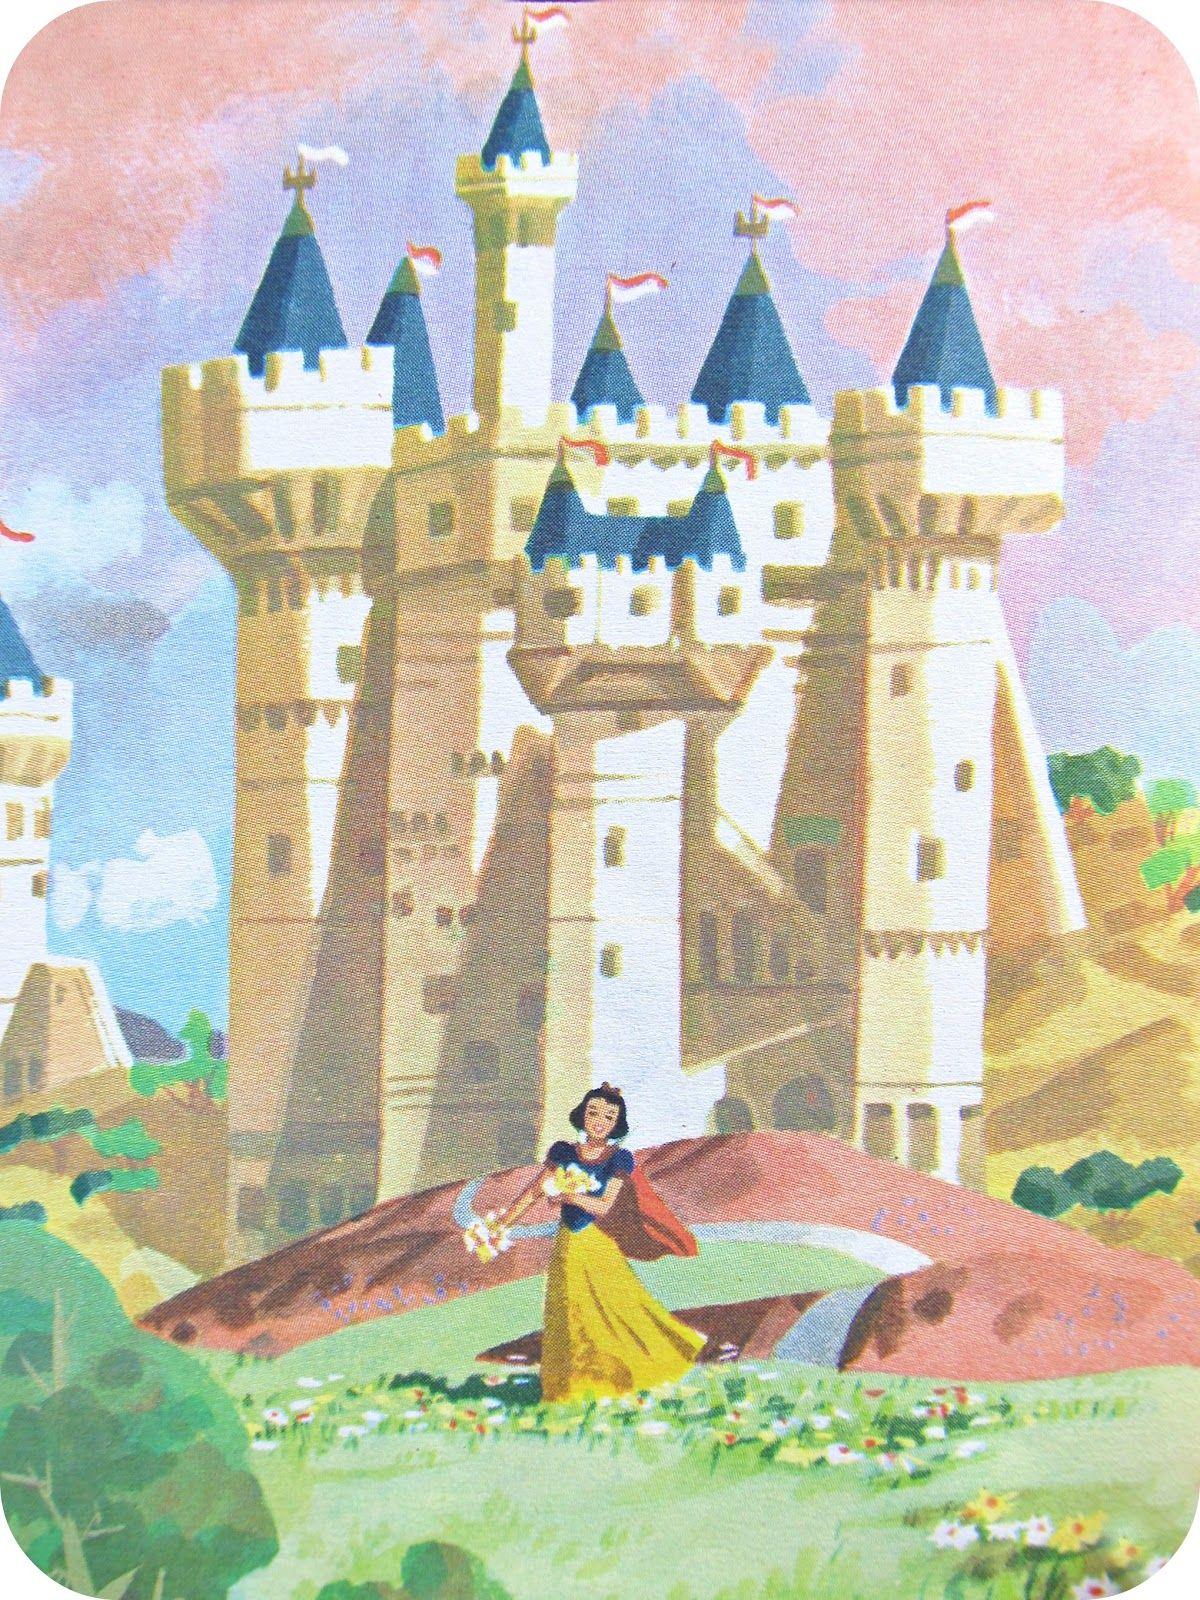 snow+white+castle.jpg 1,200×1,600 pixels Snow white